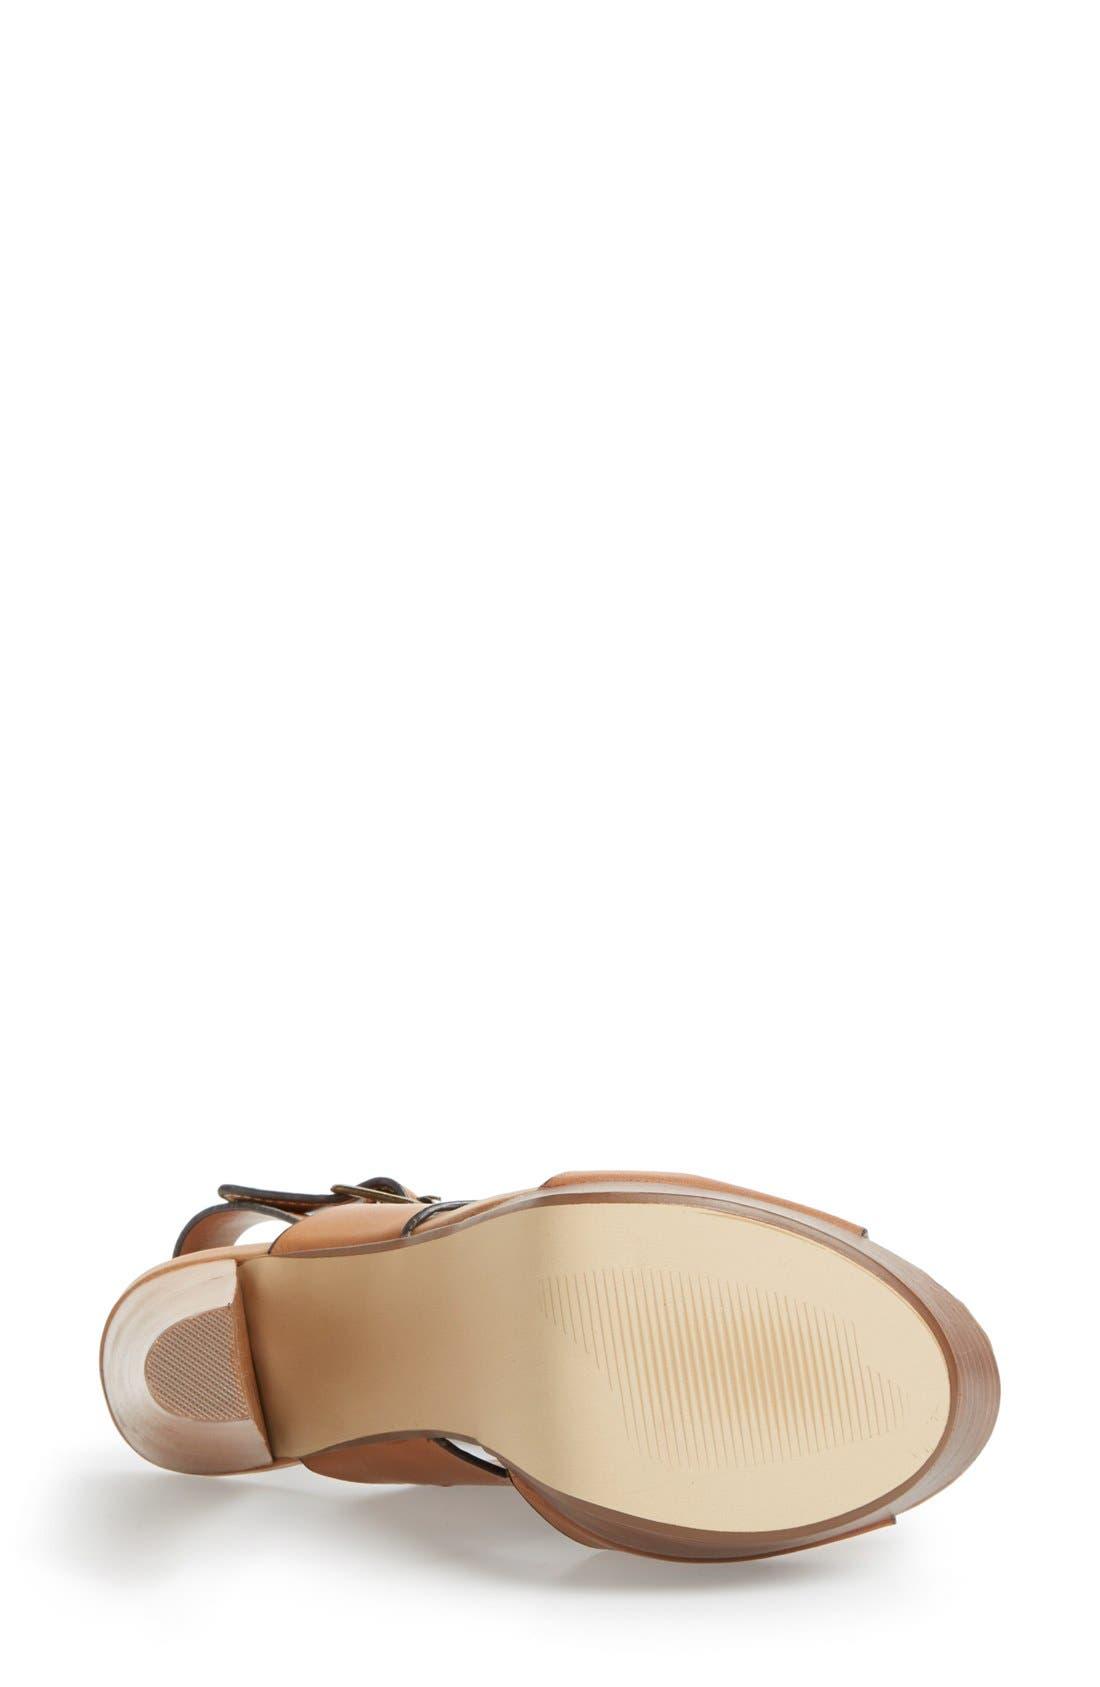 Alternate Image 4  - Steve Madden 'Dezzzy' Leather Ankle Strap Sandal (Women)